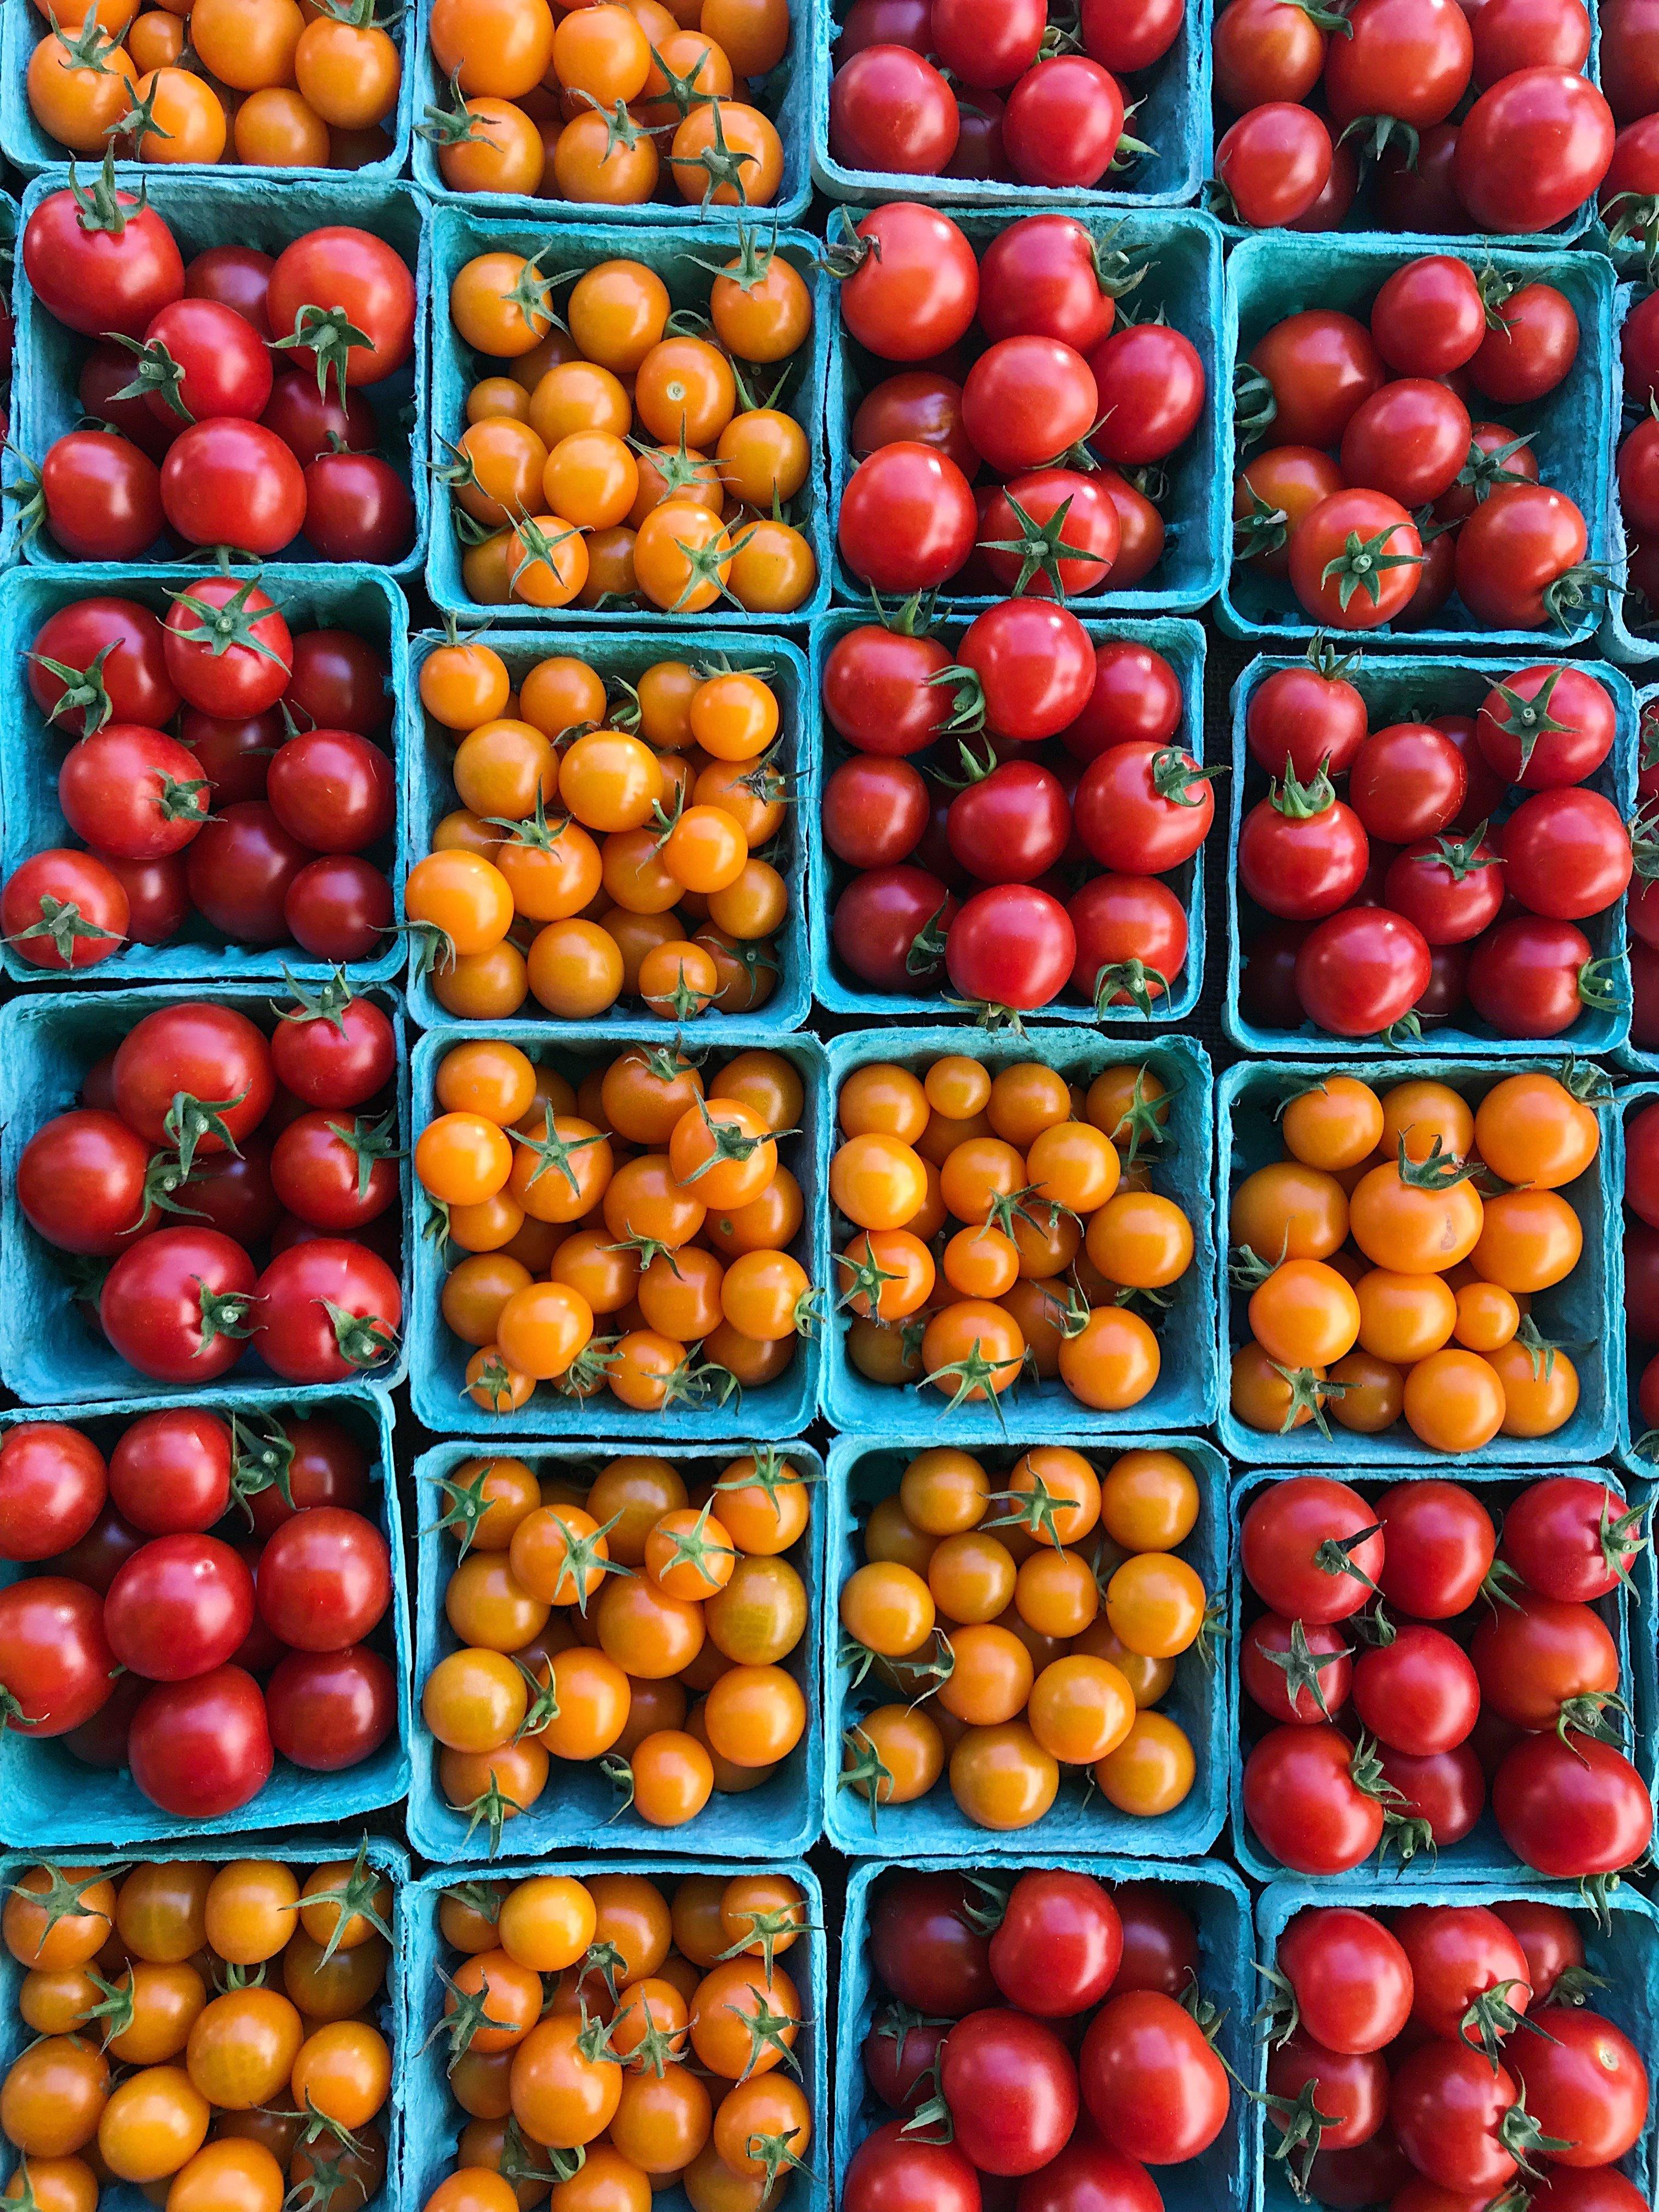 cherry tomtotes #glutenfree #pasta #glutenfreerecipes healthygffamily.com